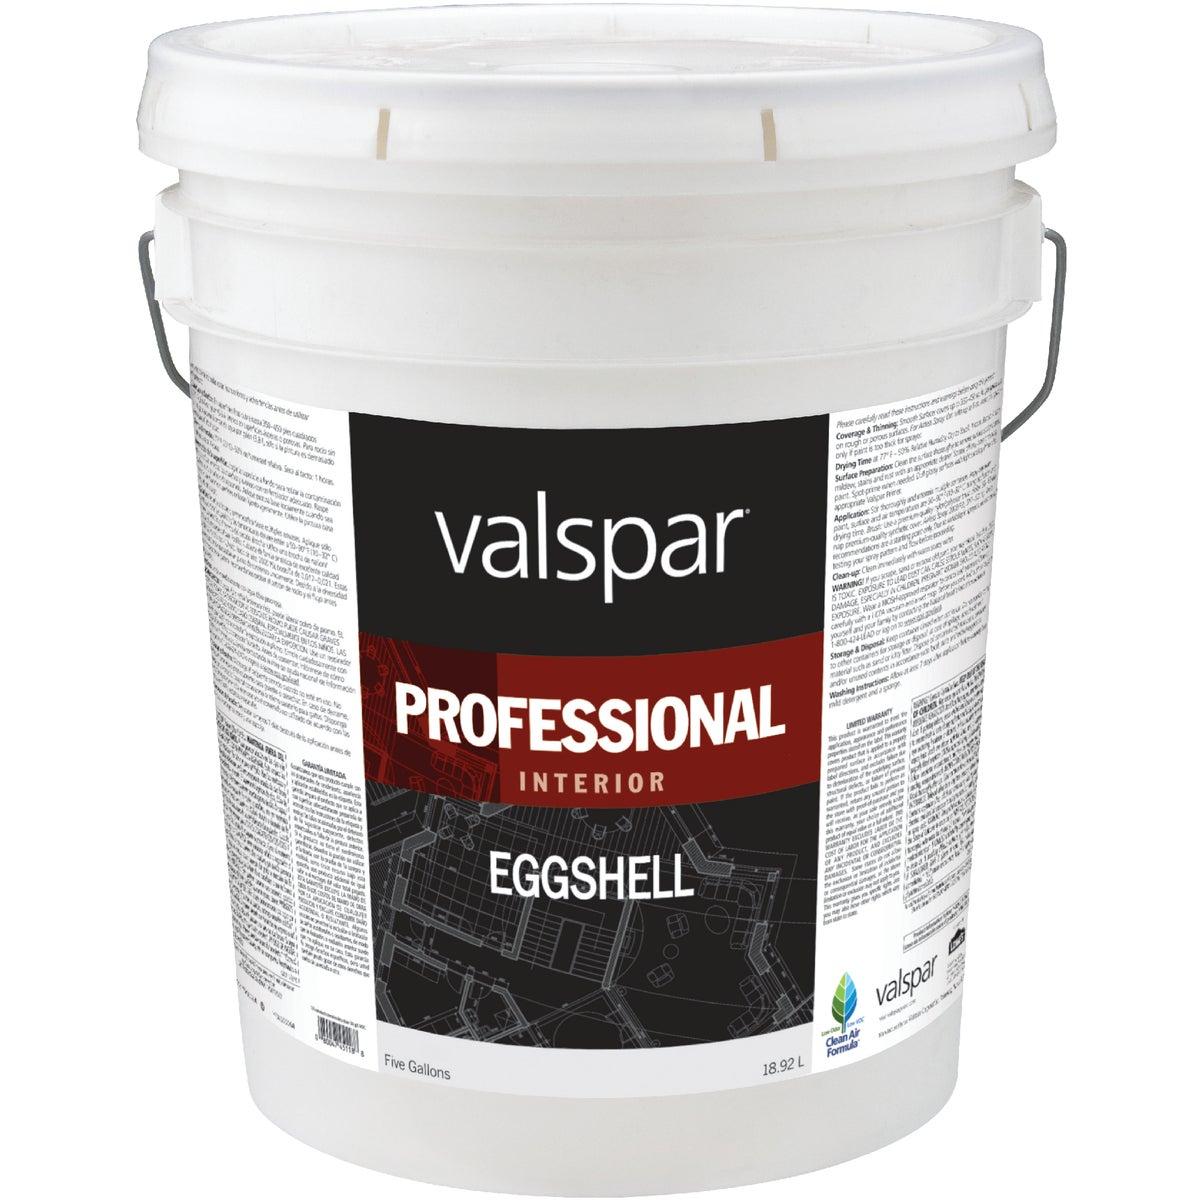 INT EGG MED BASE PAINT - 045.0011812.008 by Valspar Corp